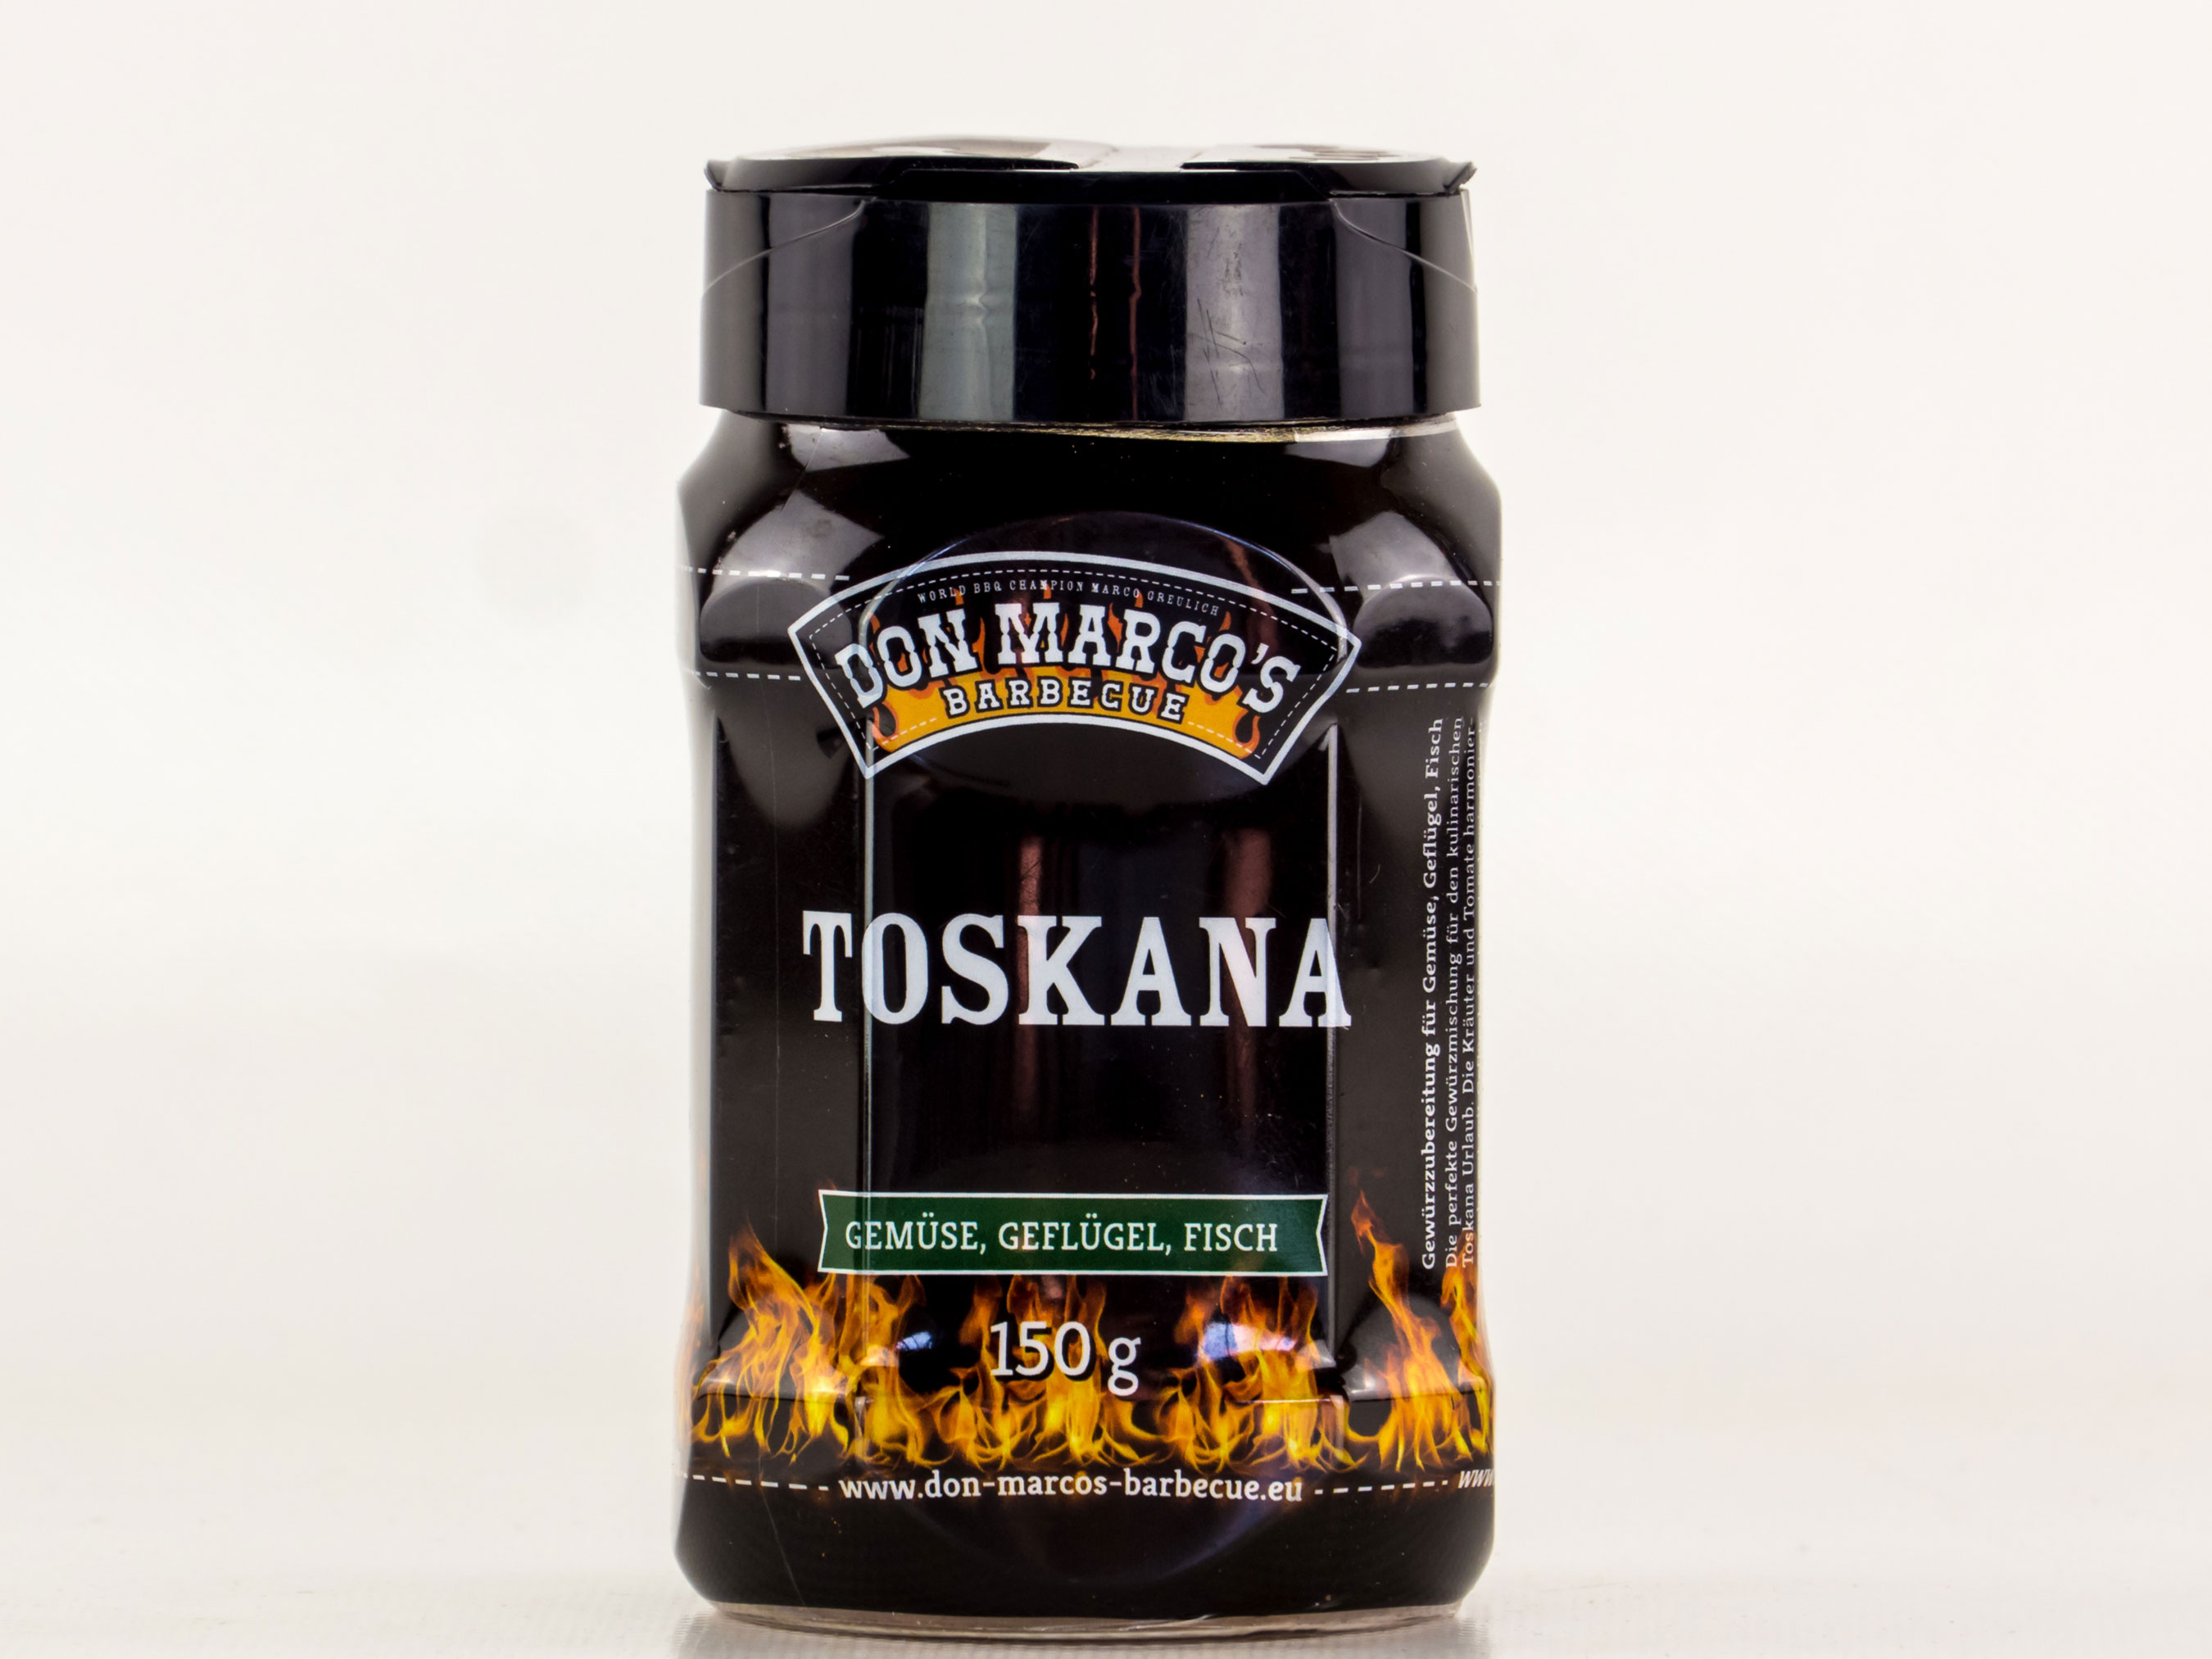 Don Marco´s Barbecue BBQ Gewürz / Gewürzmischung Toskana 150g Bild 1